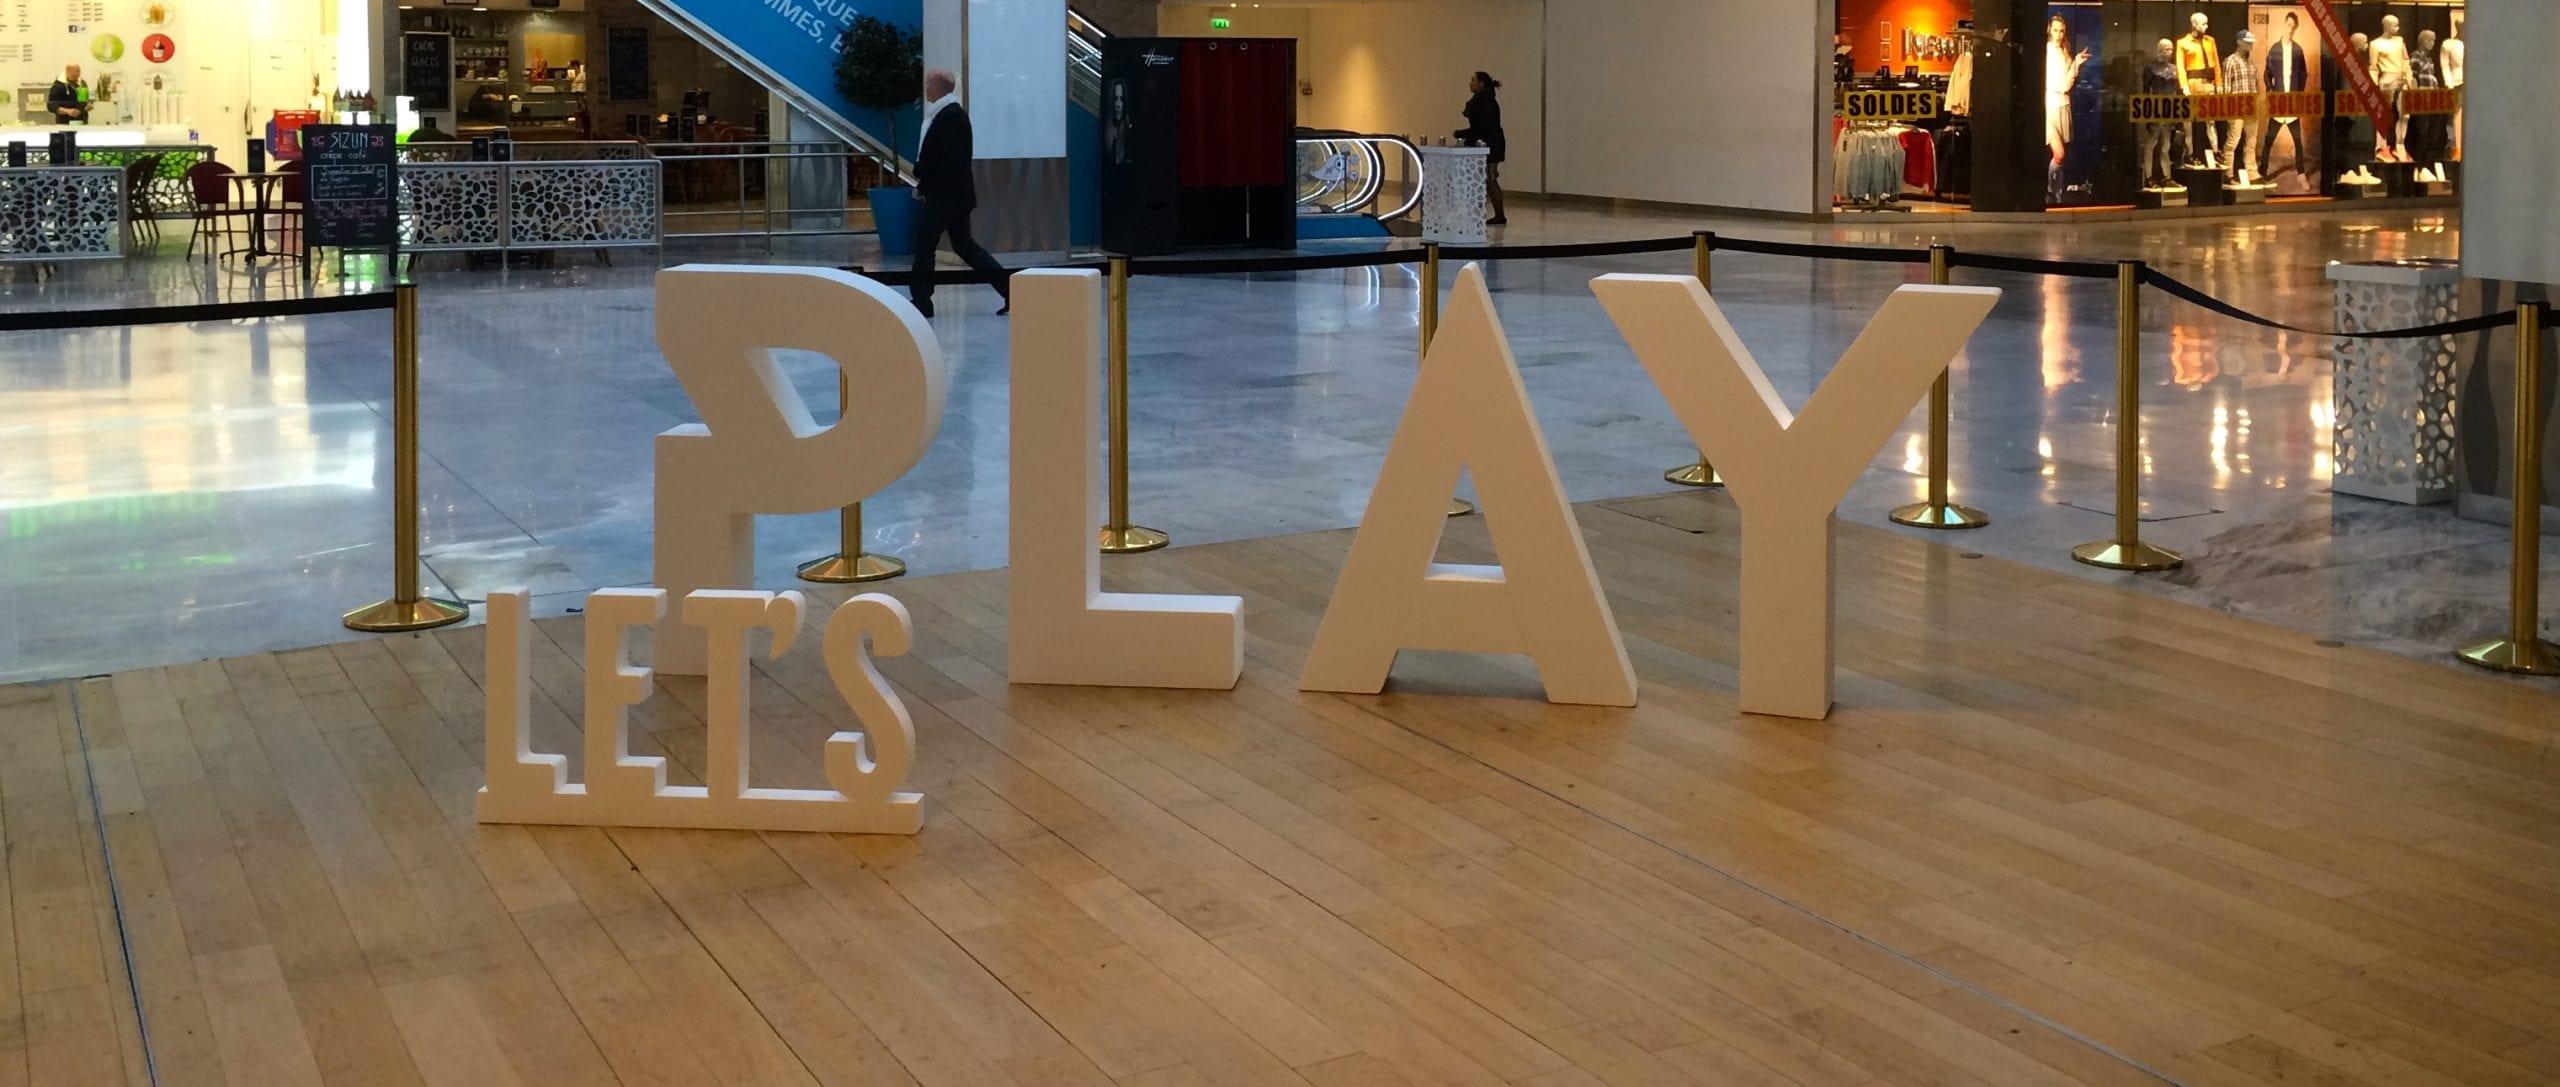 lettres blanches en polystyrène lets play